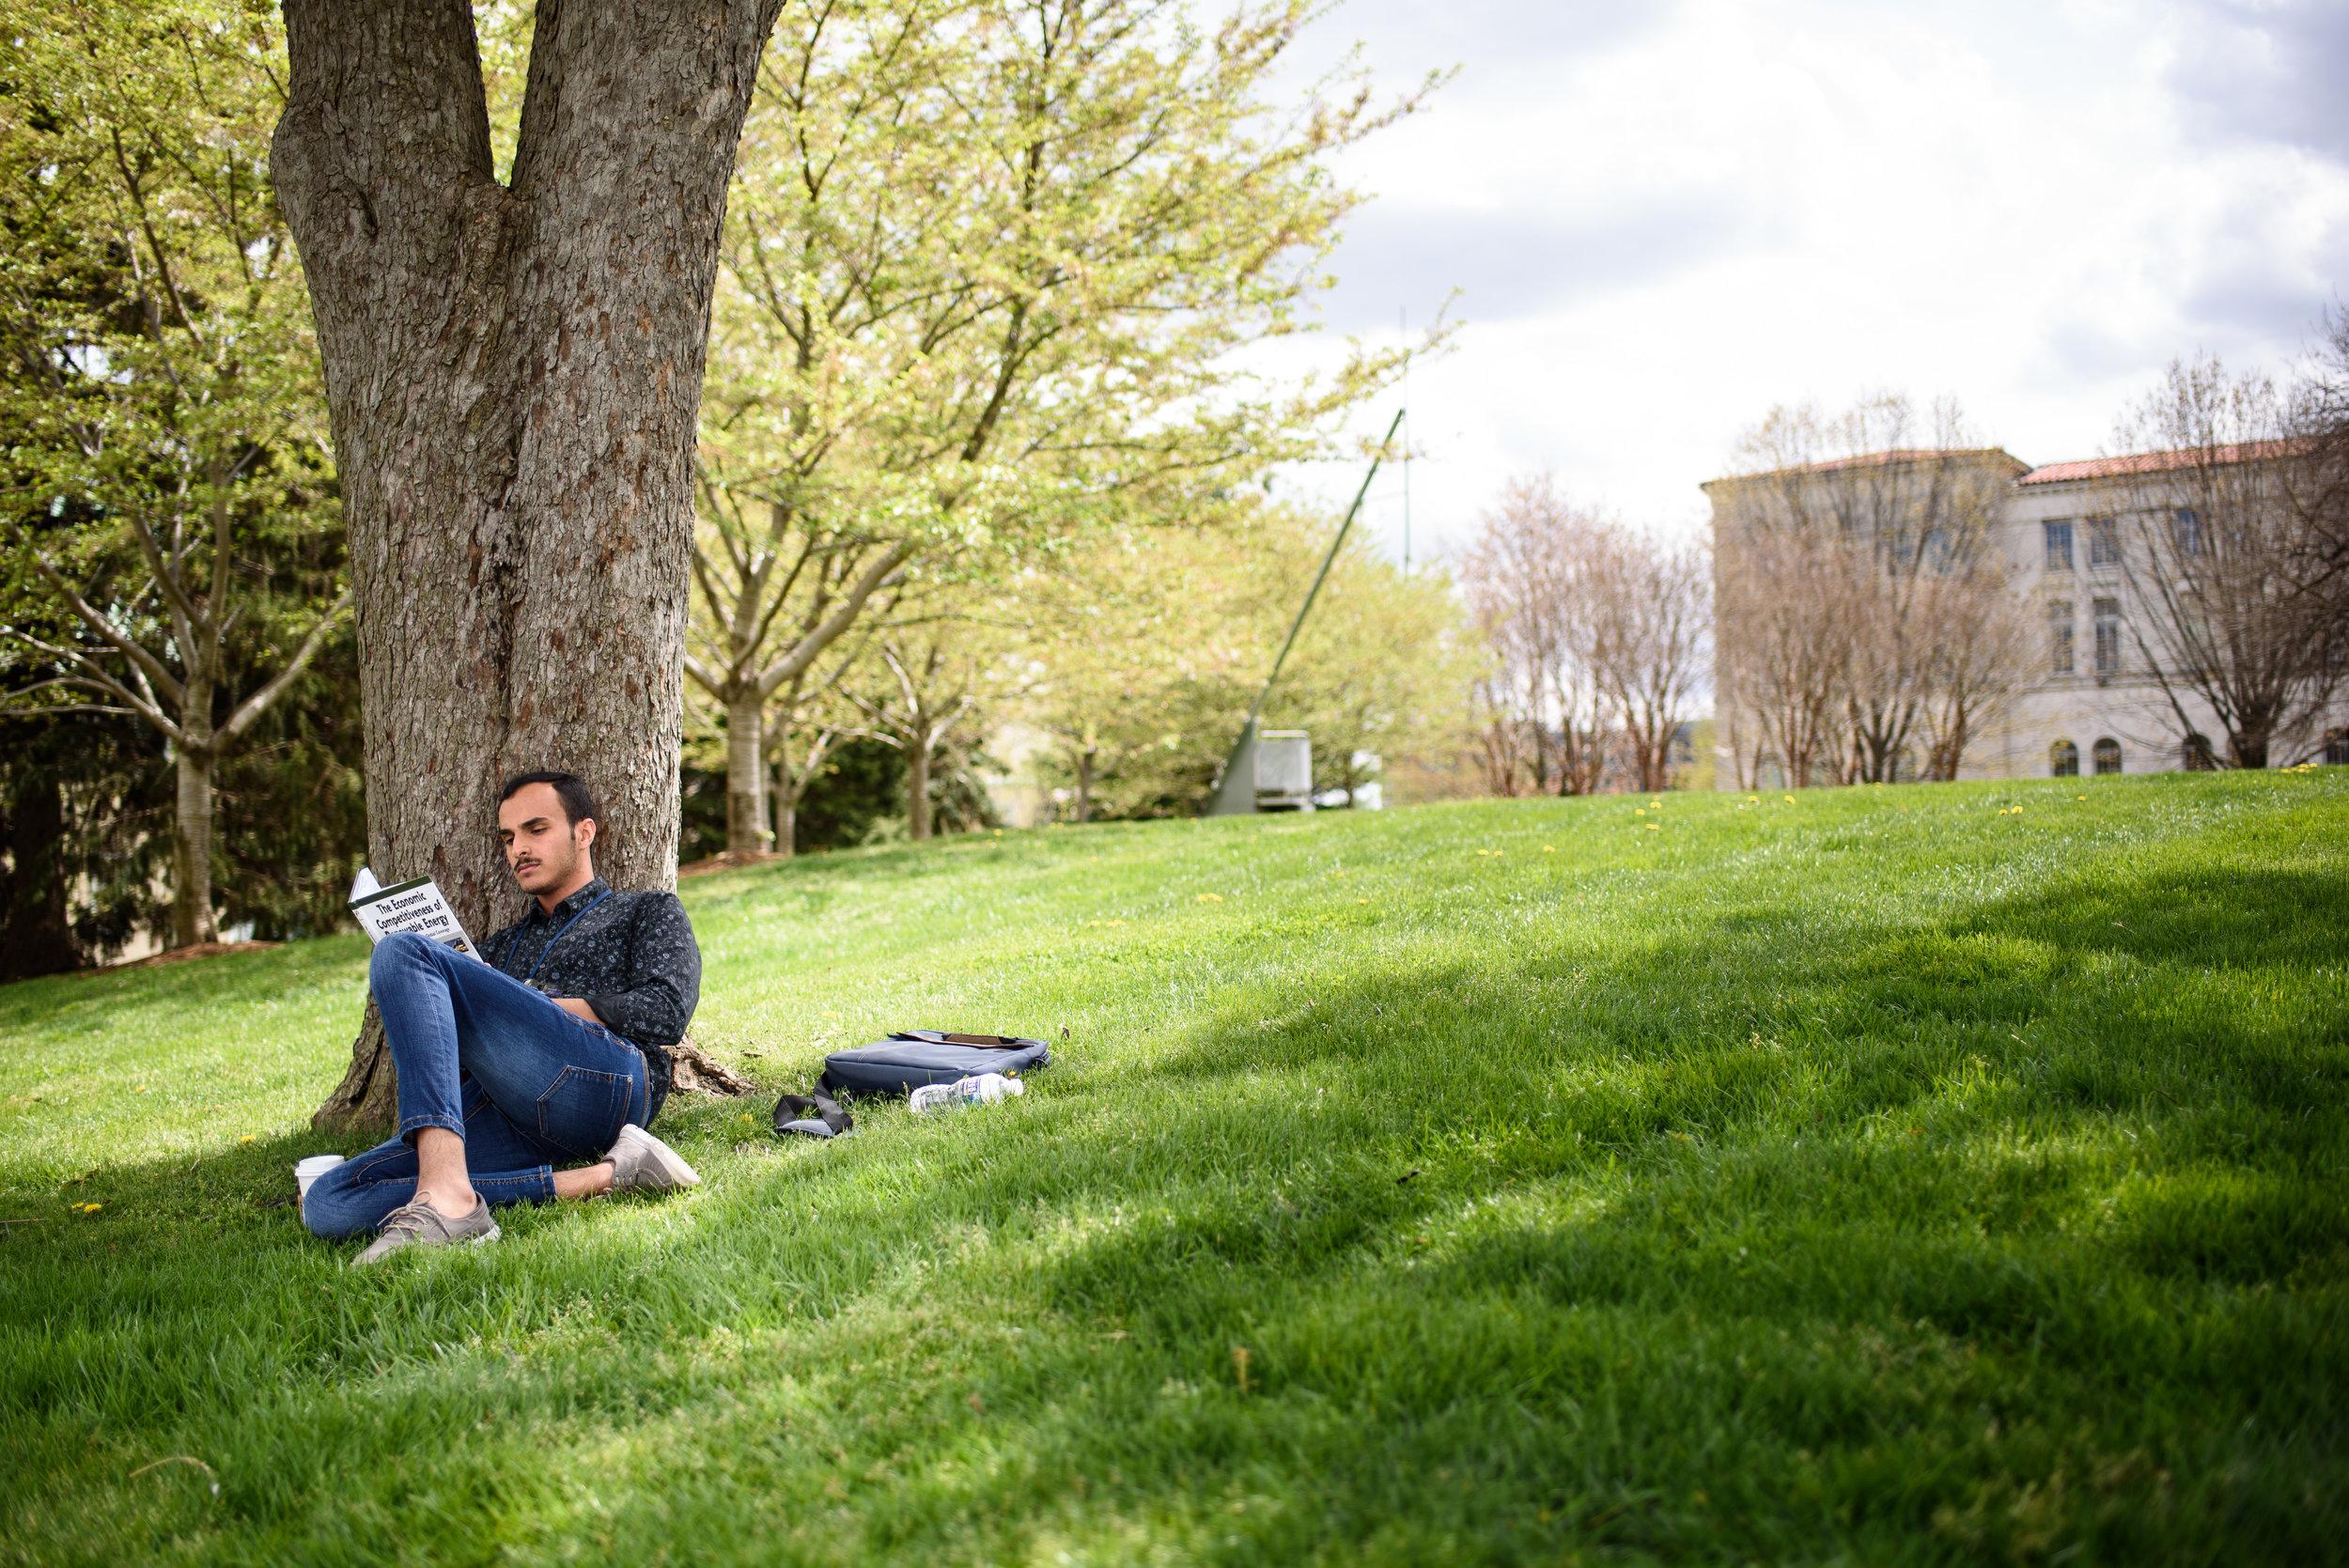 Catholic University studetns reading a book under a tree.